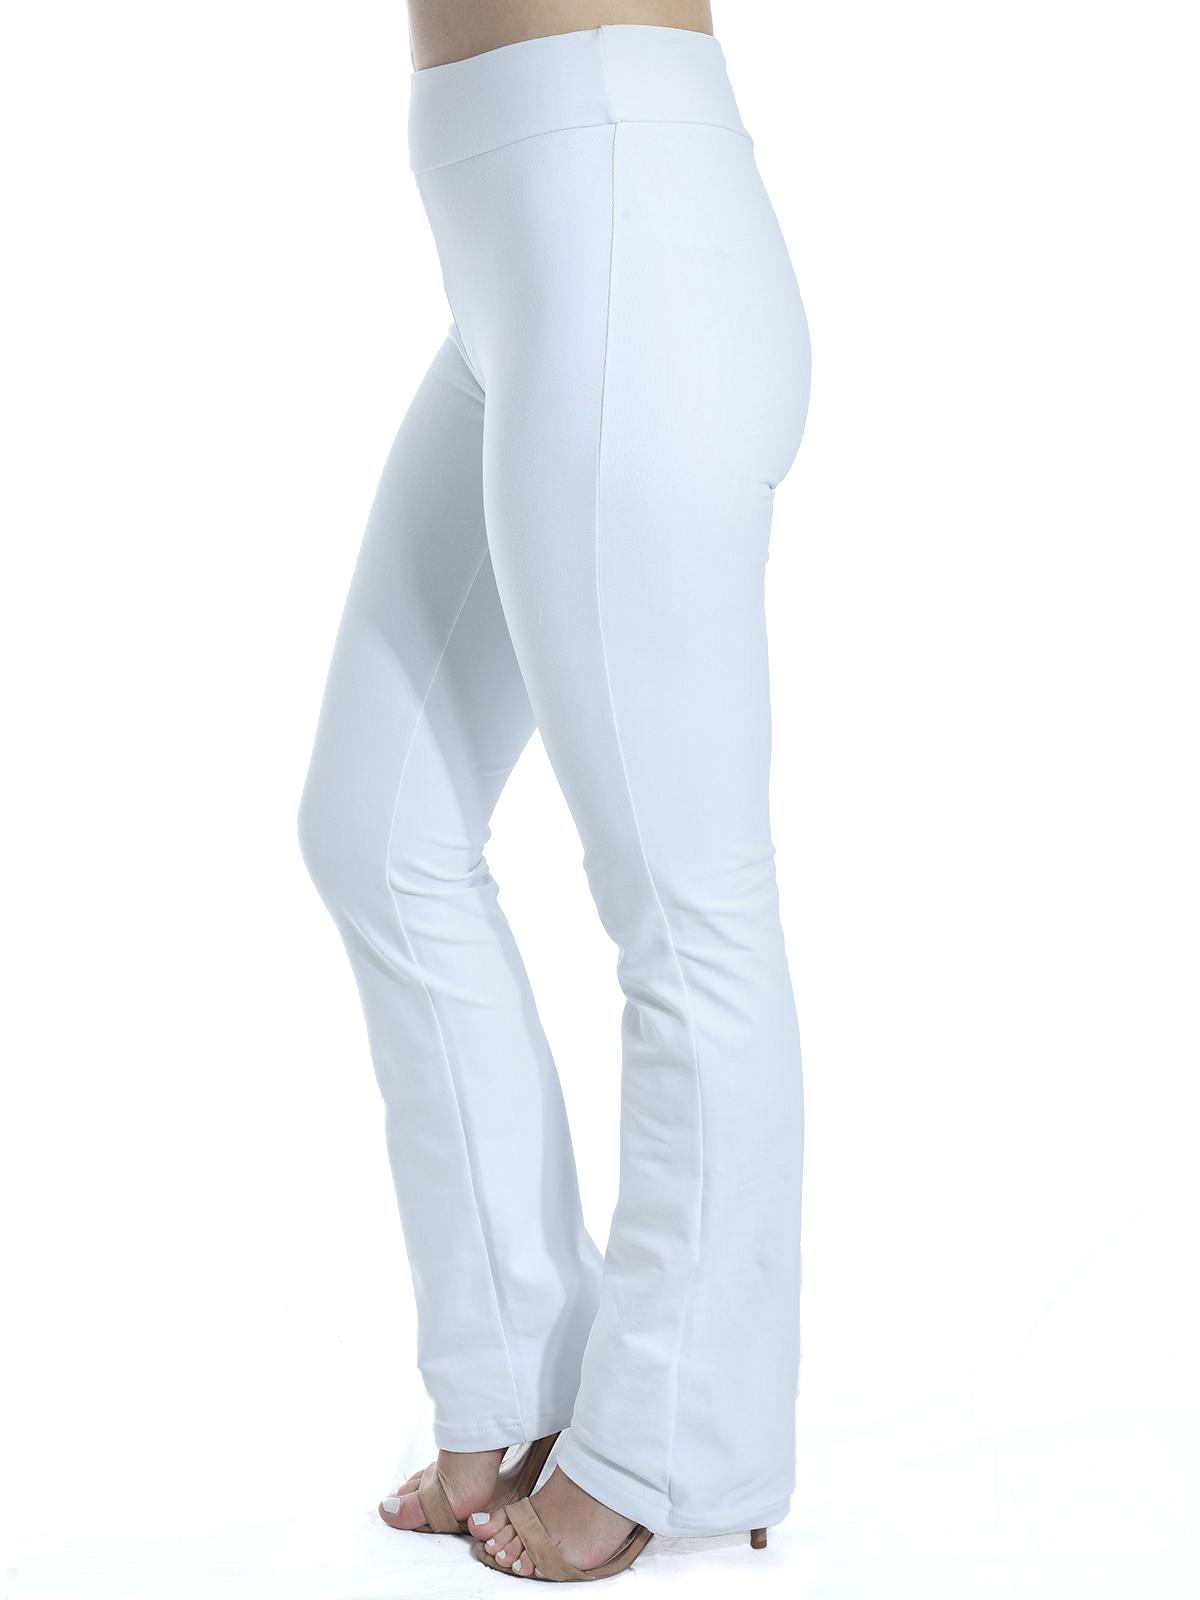 Calça Bailarina Feminina Fitness Confort Branca